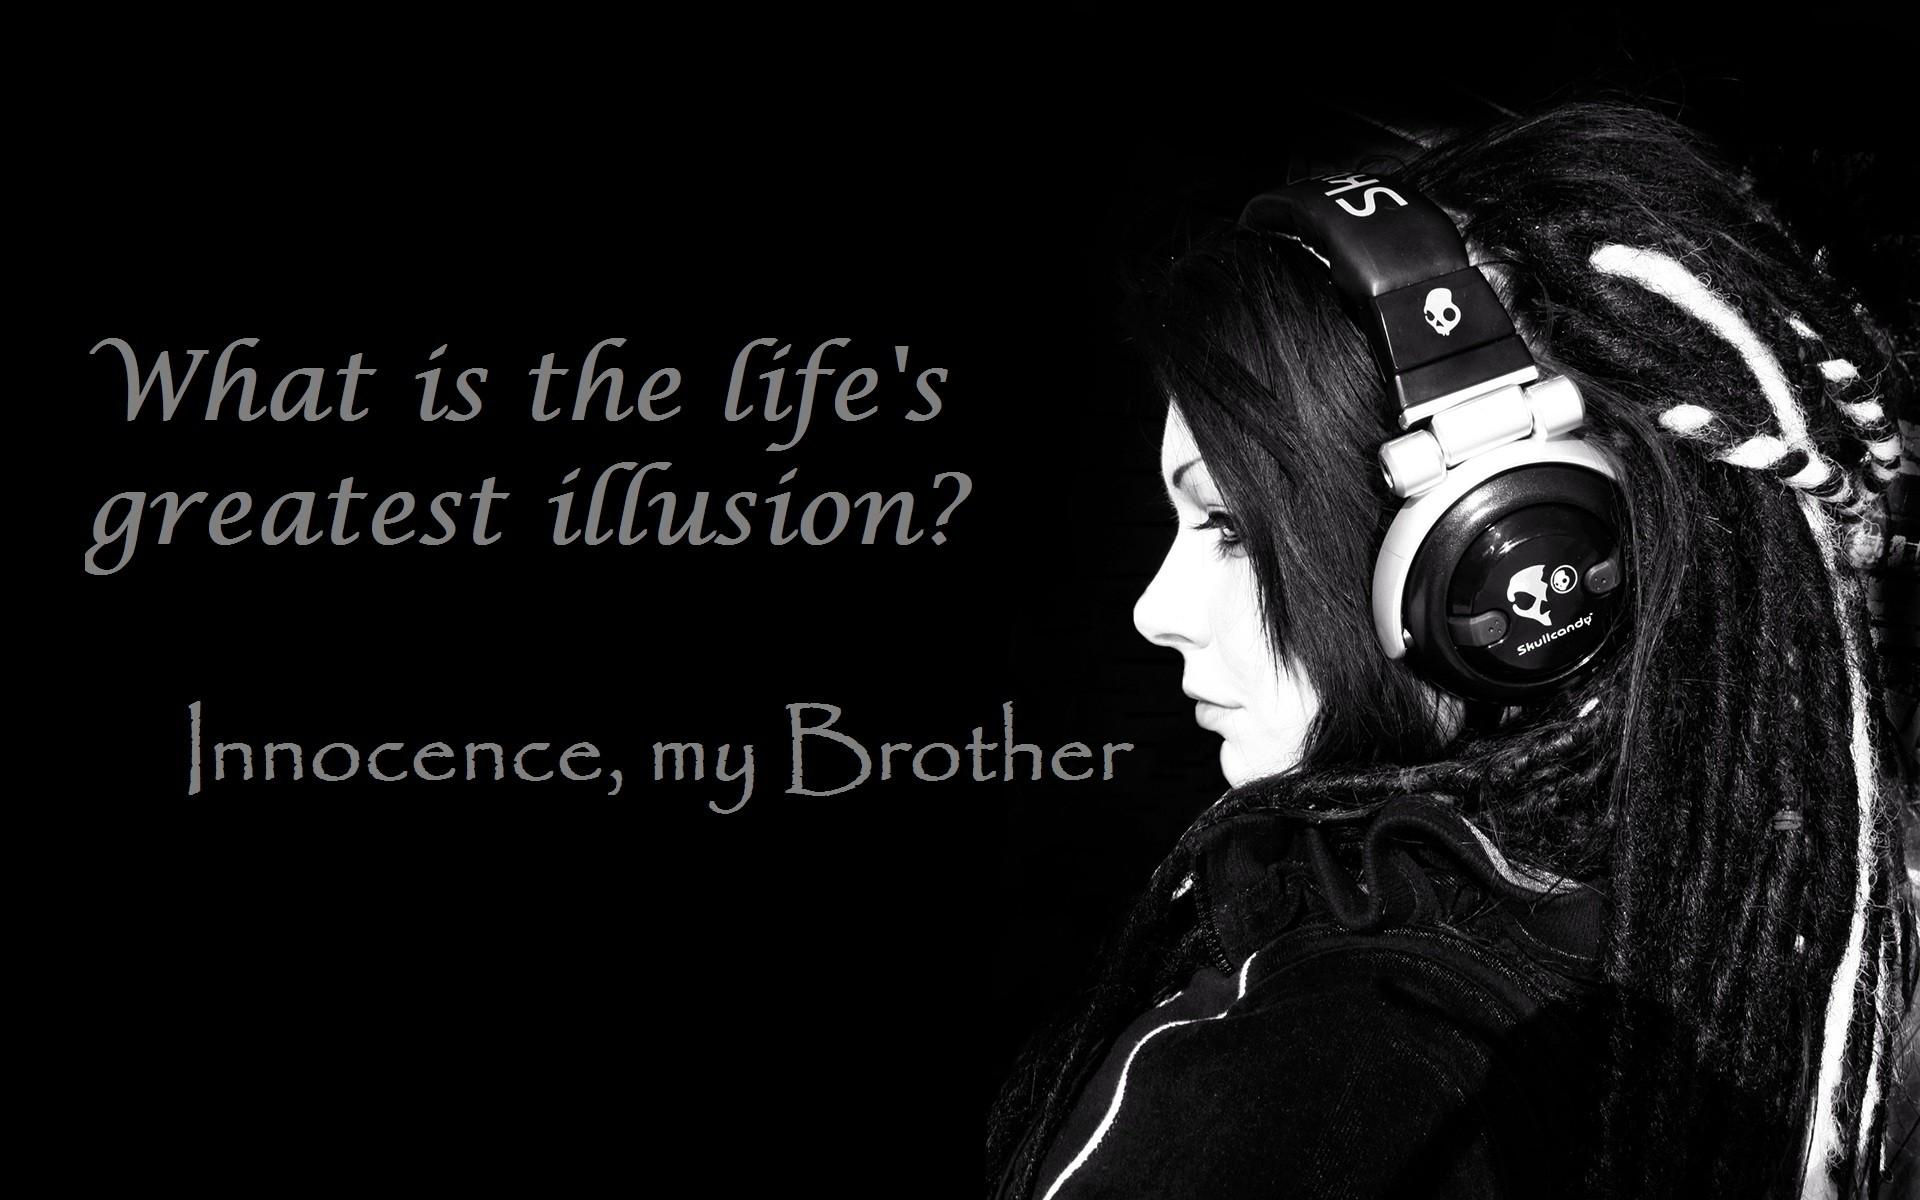 Quote Women Monochrome Headphones Emotion Dark Brotherhood Darkness Black And White Photography Album Cover